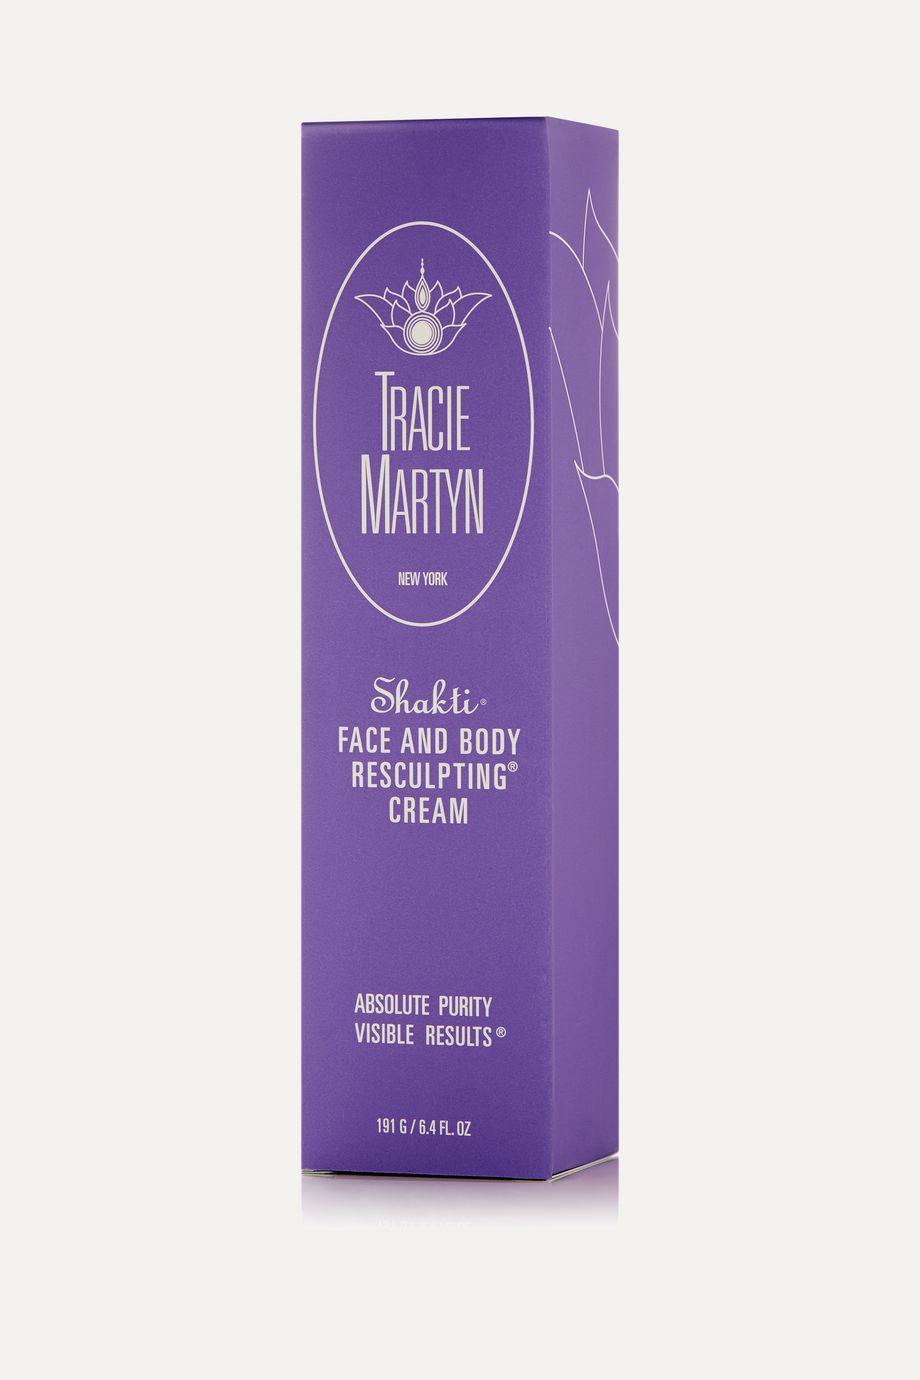 Tracie Martyn Shakti Face and Body Resculpting Cream, 200ml